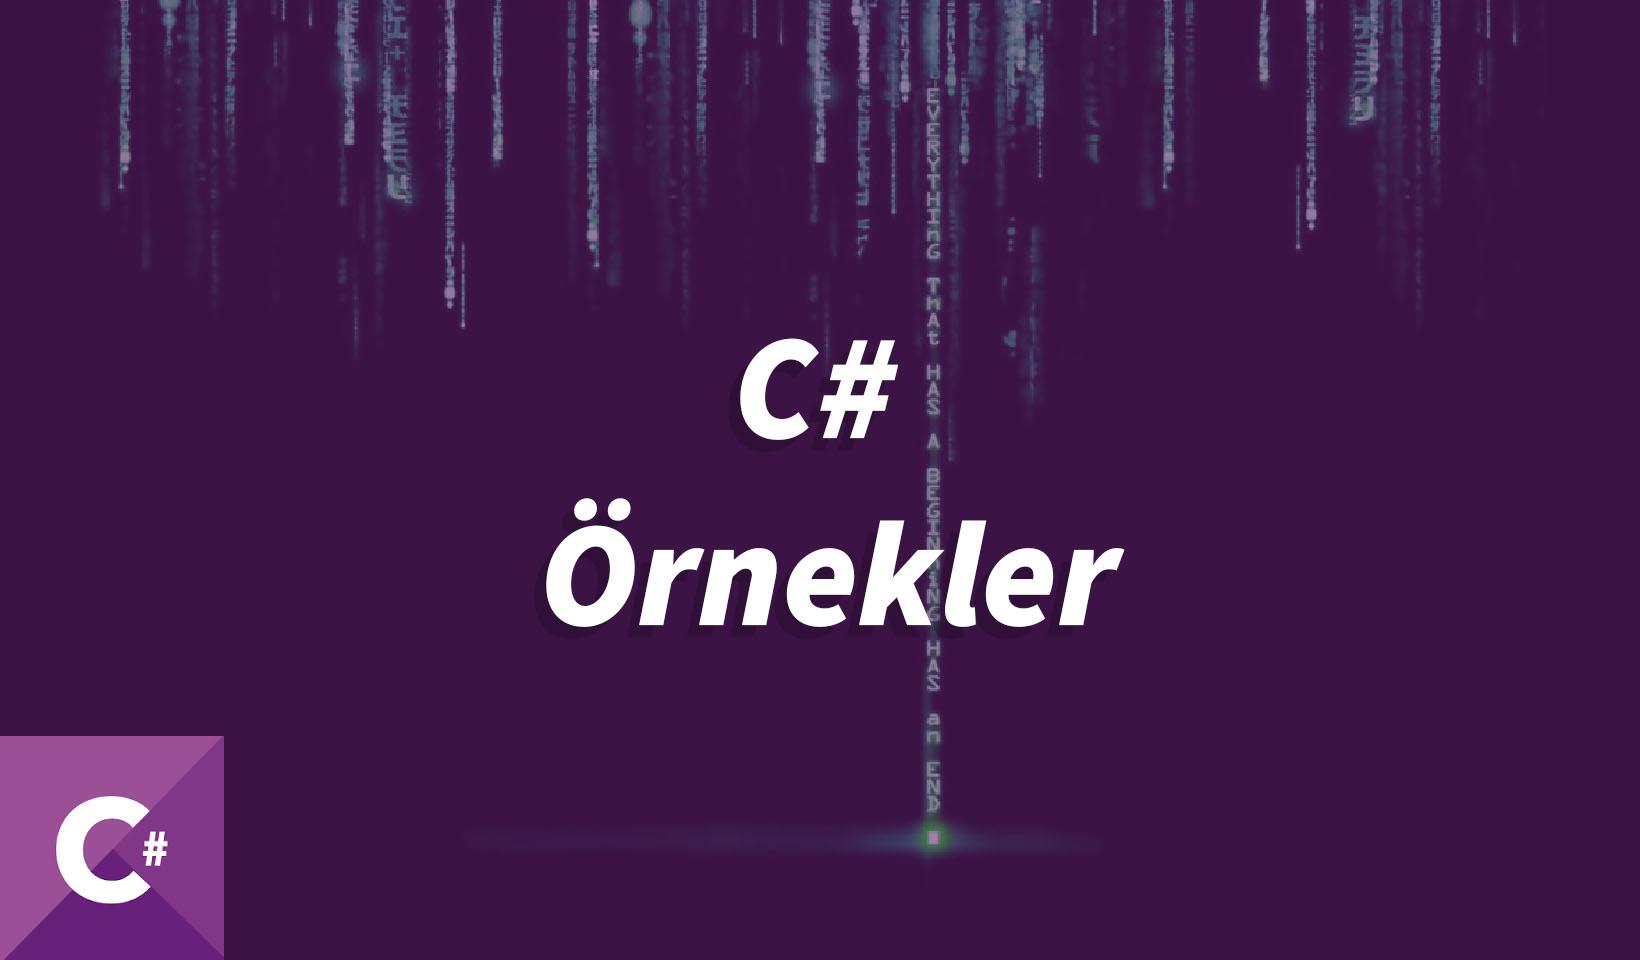 c#örnekleri, c# örnek, c sharp örnek, c sharp örnekleri, c# if else örnekleri, c# if örnekleri, c# for örnekleri, for örnekleri c#, if else örnekleri c#